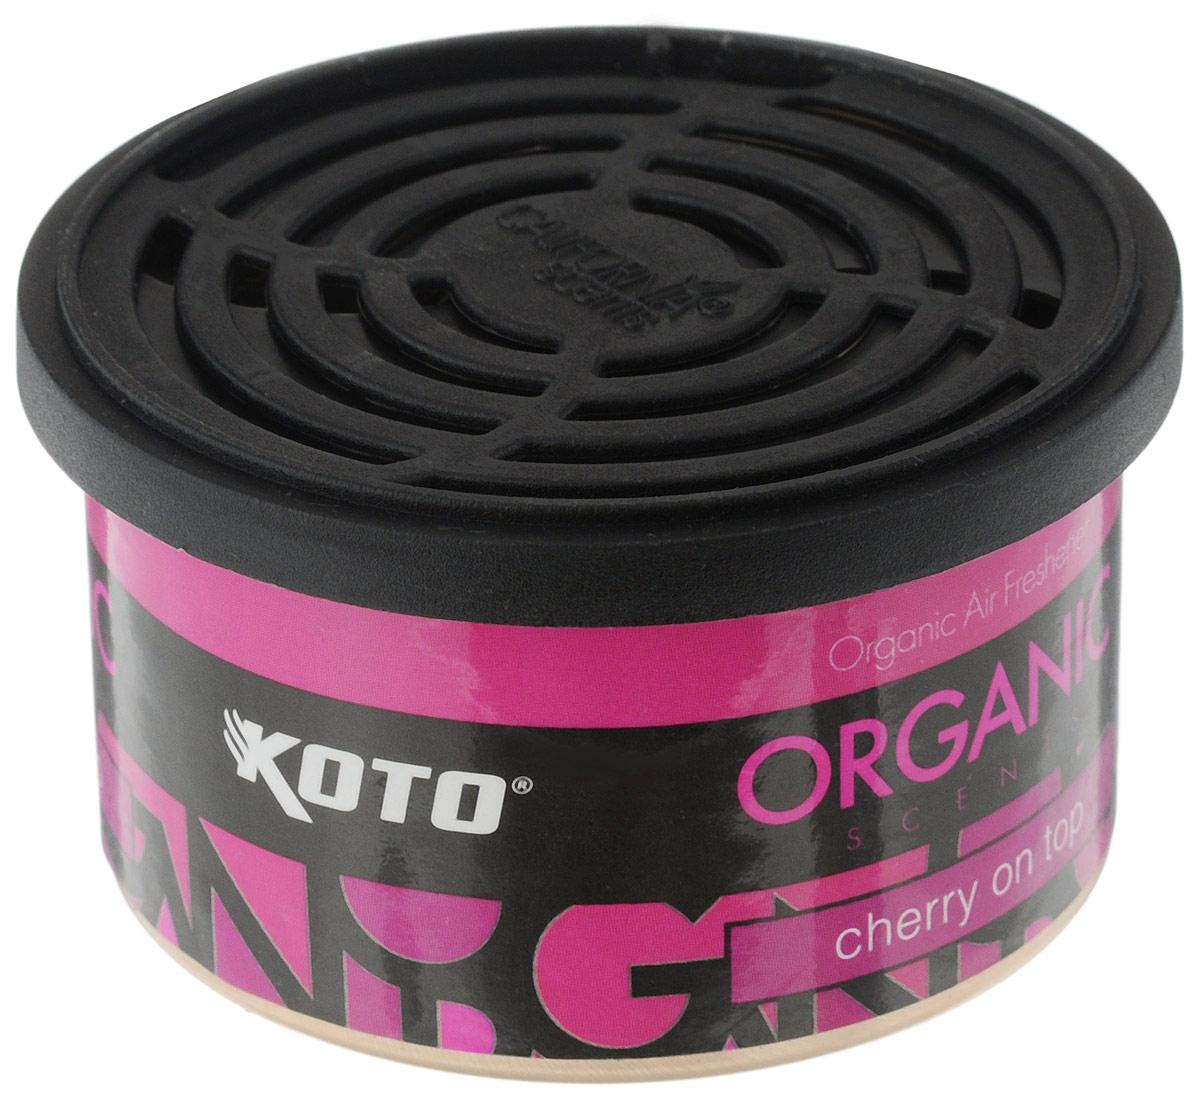 Ароматизатор автомобильный Koto Organic, вишня